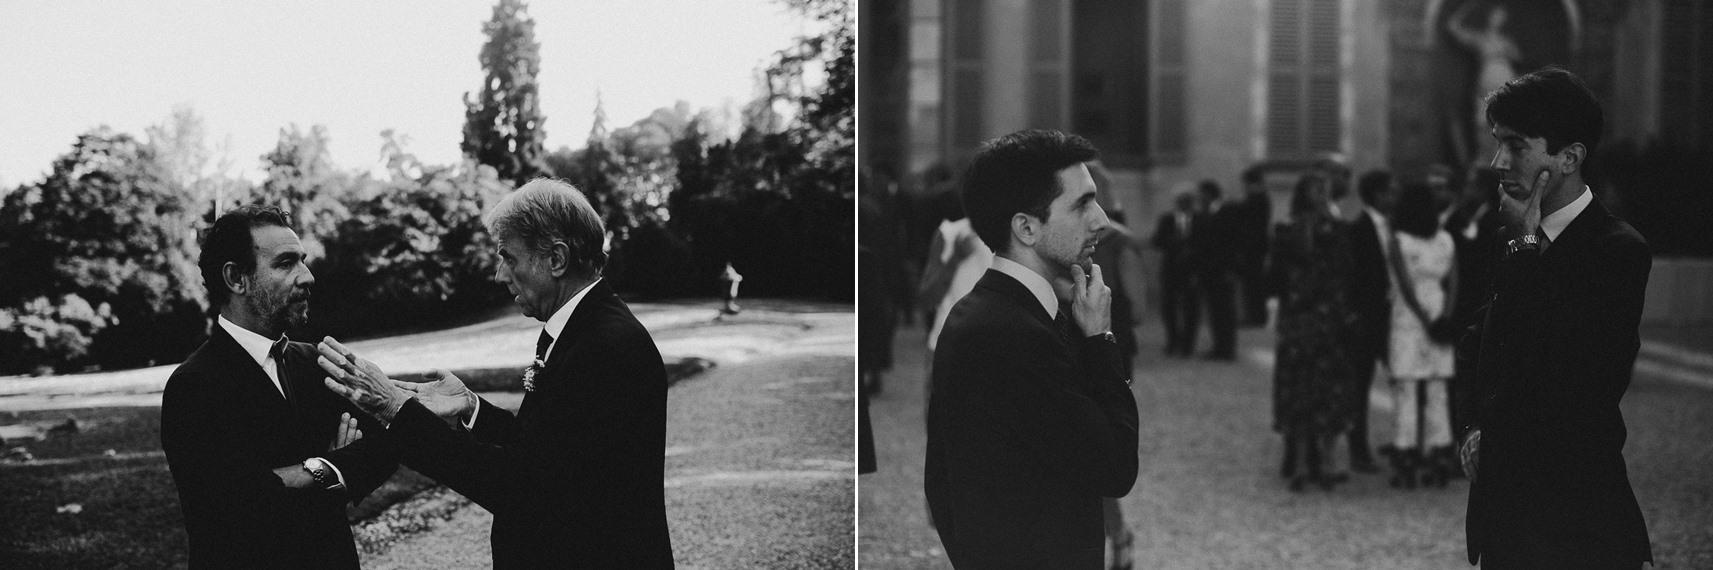 wedding-in-italy (27).jpg